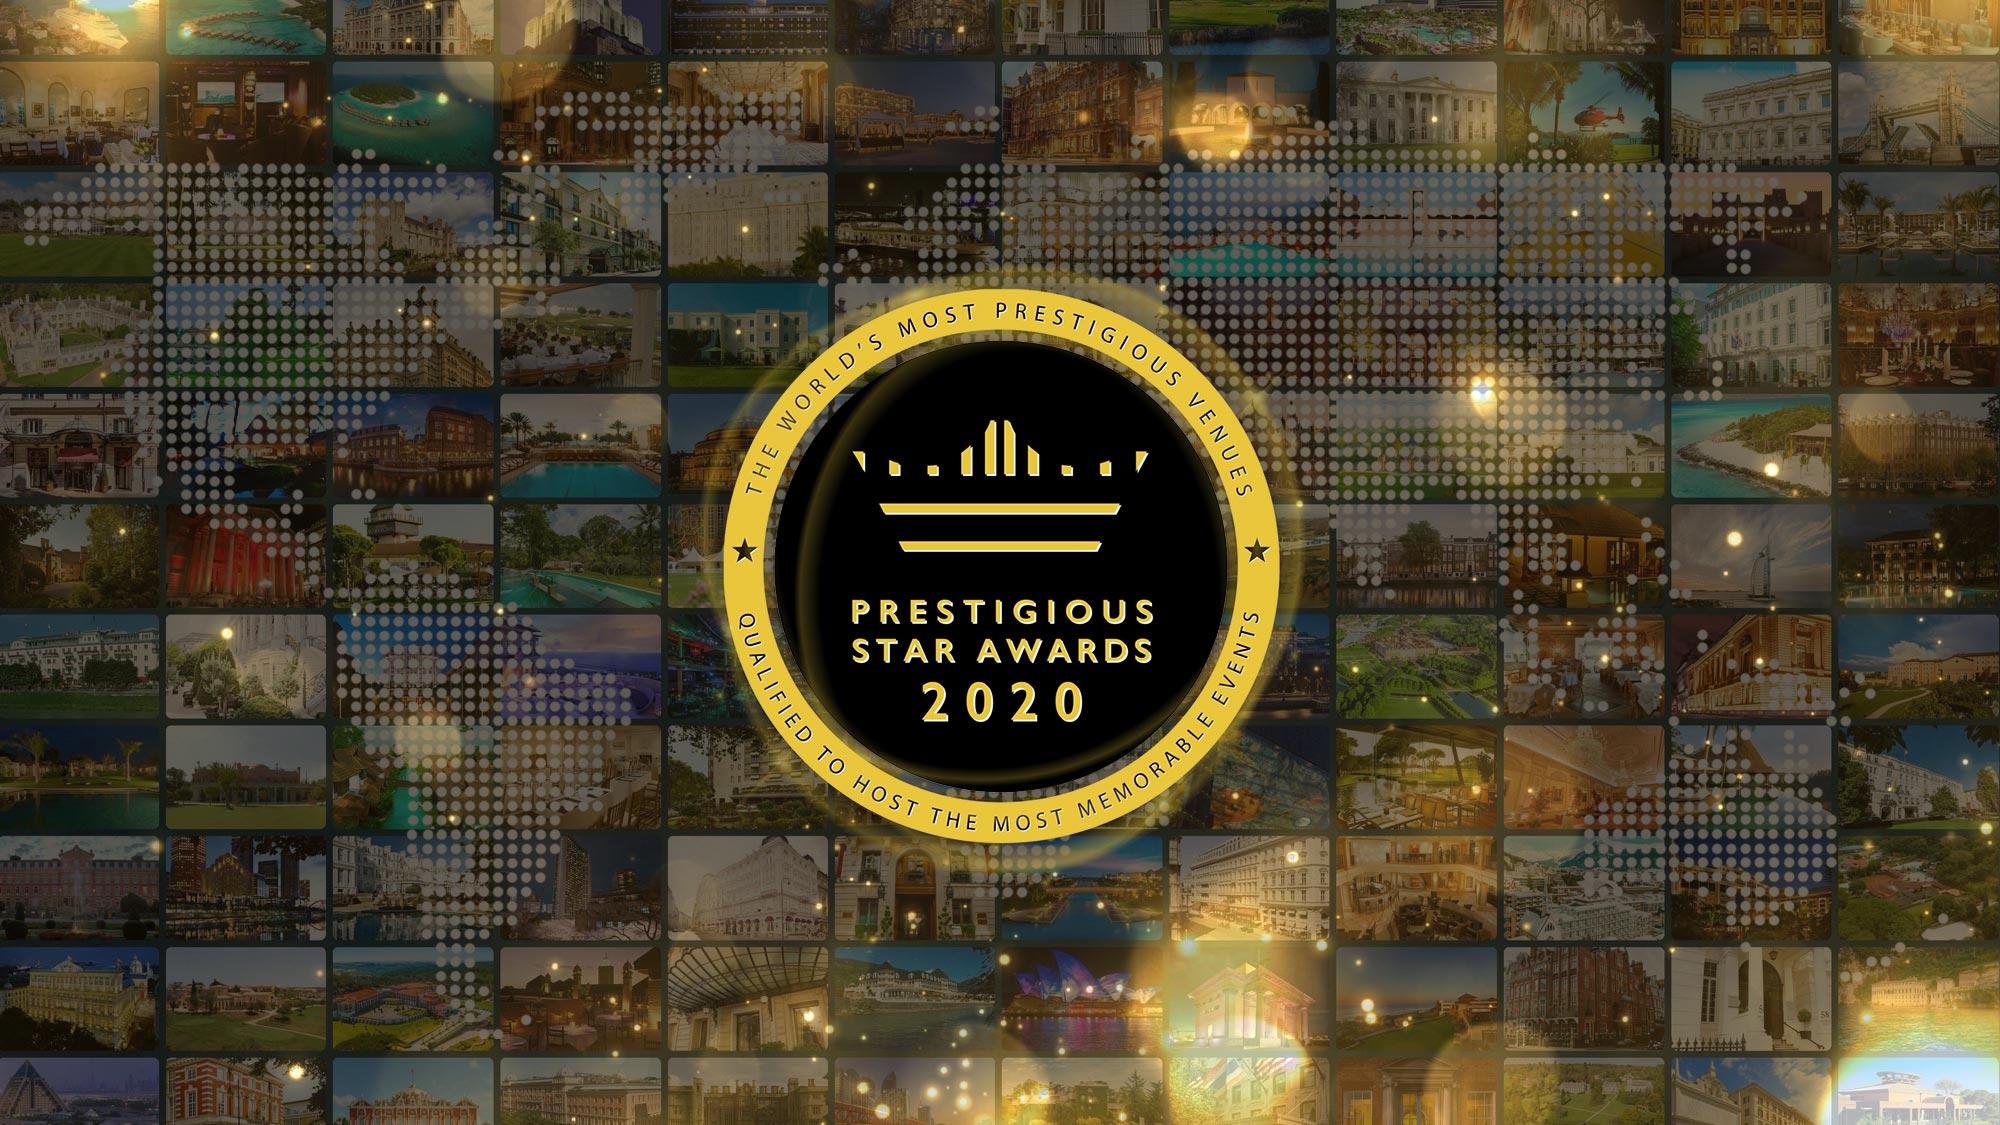 Prestigious Star Awards 2020 Global Launch